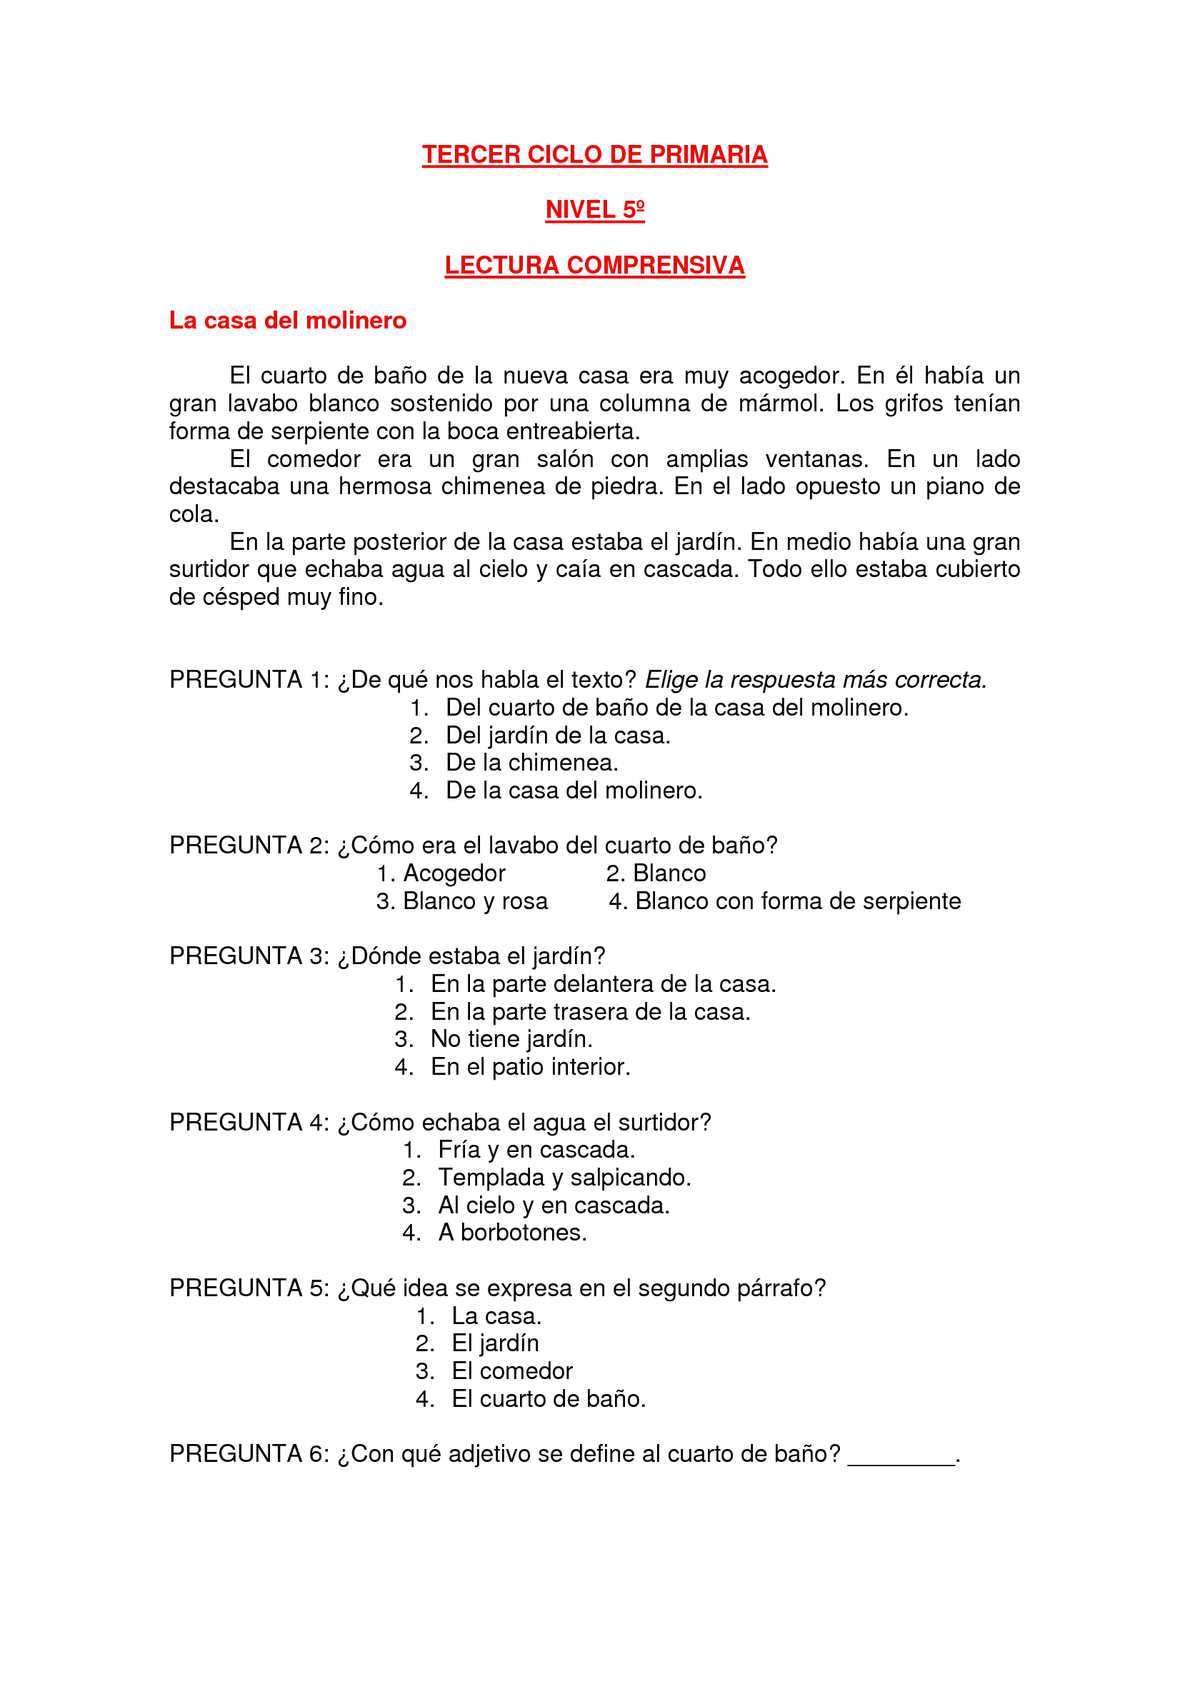 Calaméo - LECTURAS COMPRENSIVAS TERCER CICLO PRIMARIA.